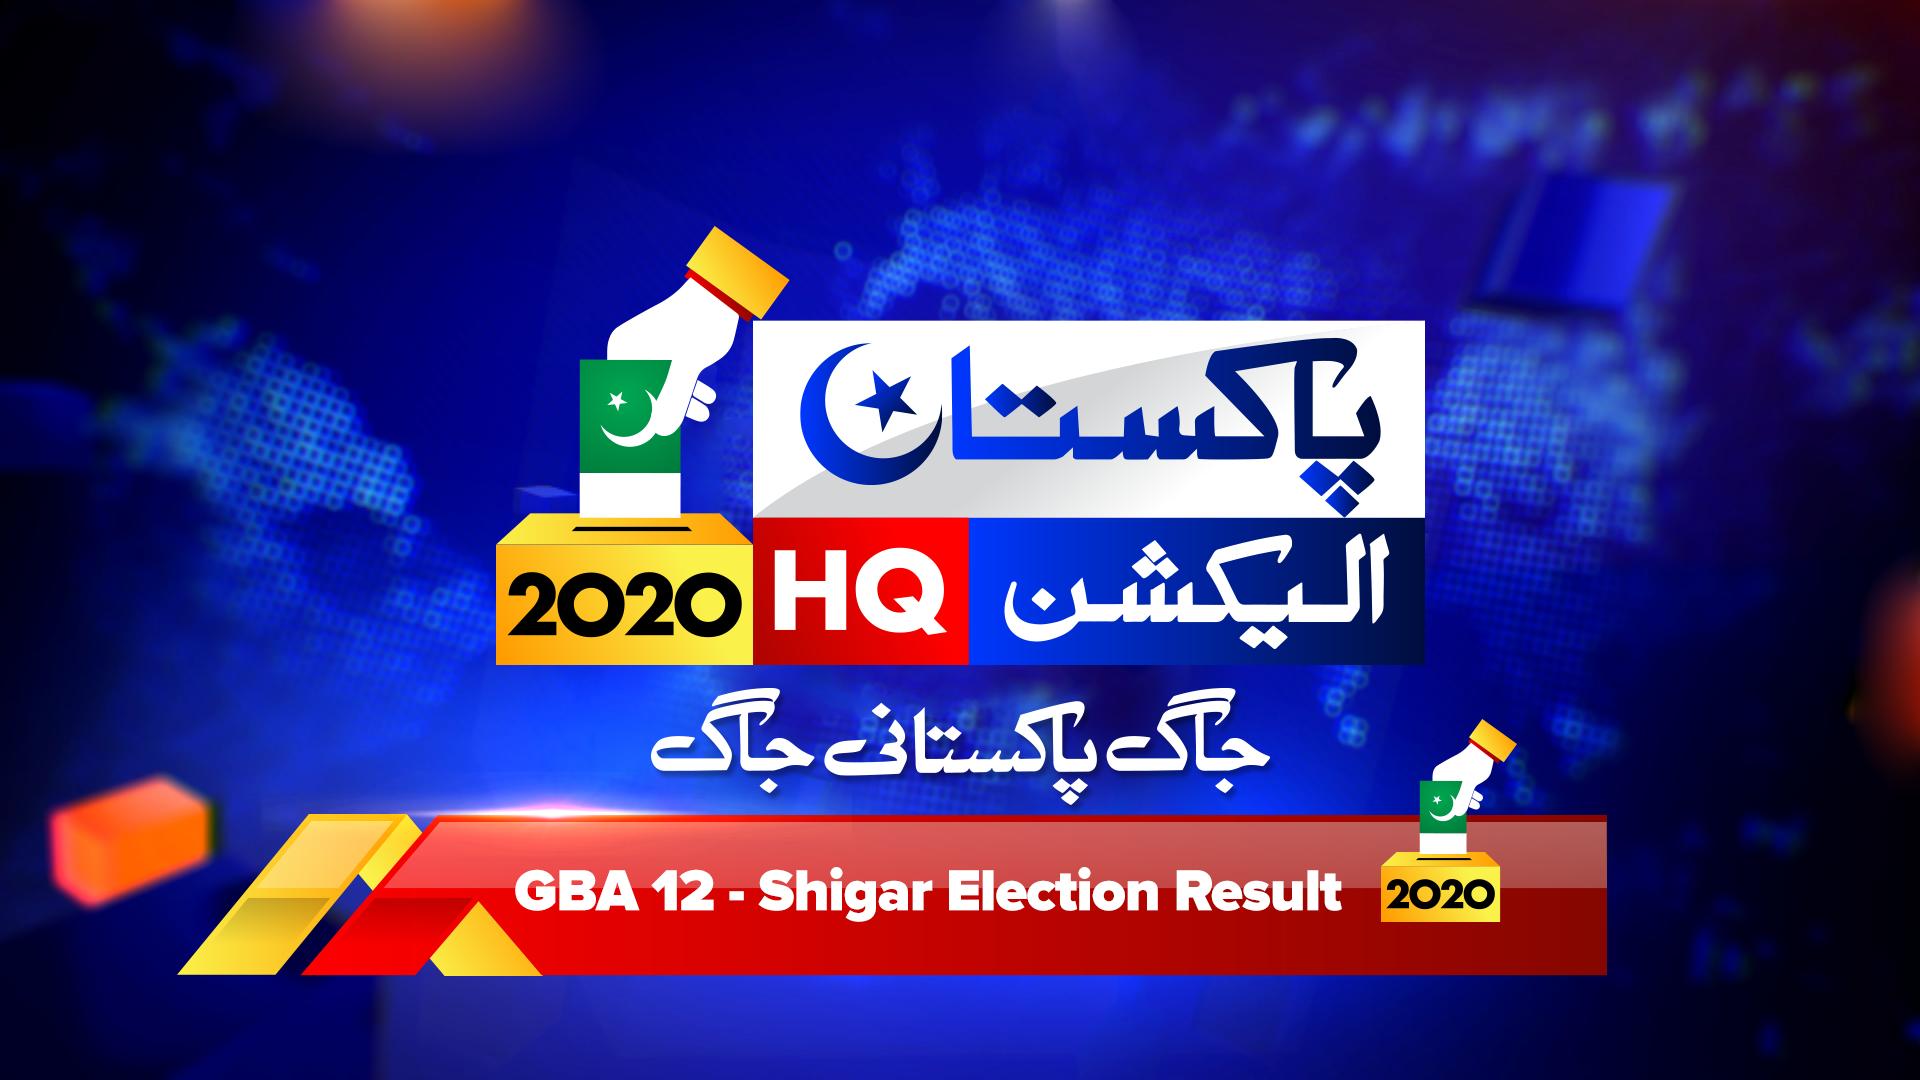 GBA 12 Gilgit 12 Election Result